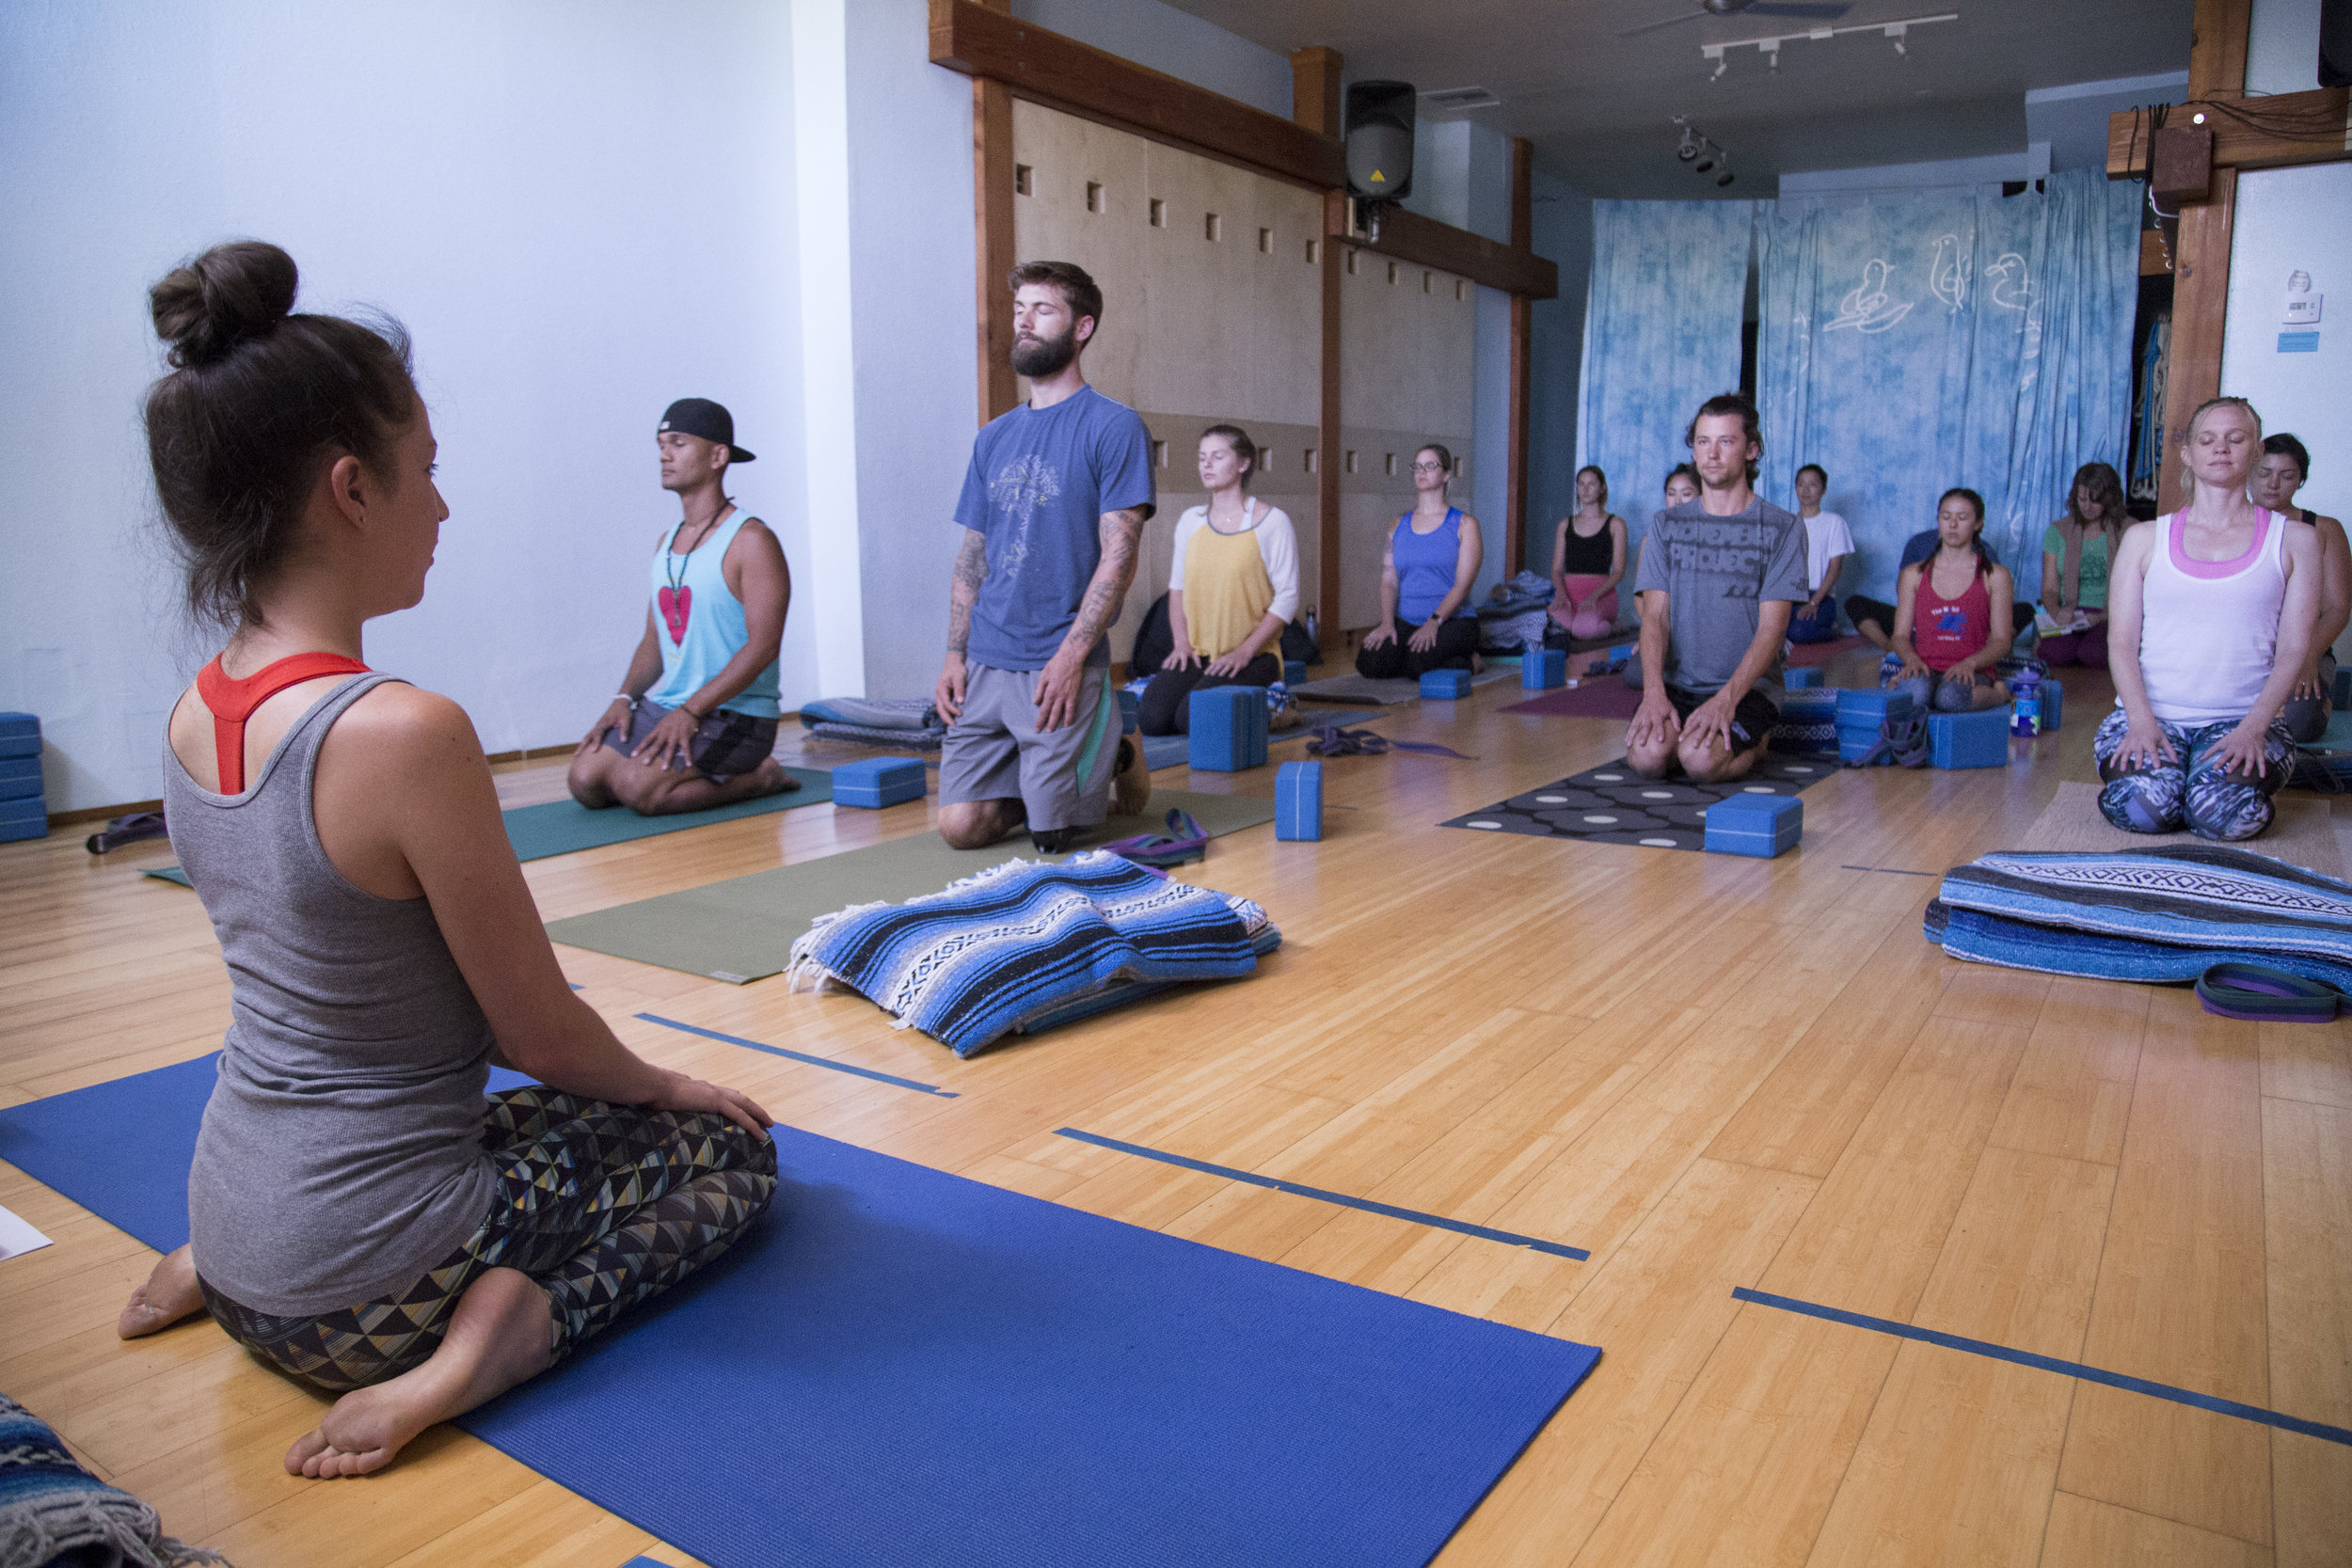 tips-copywriting-san-diego-yoga-teacher-allison-evelyn-gower